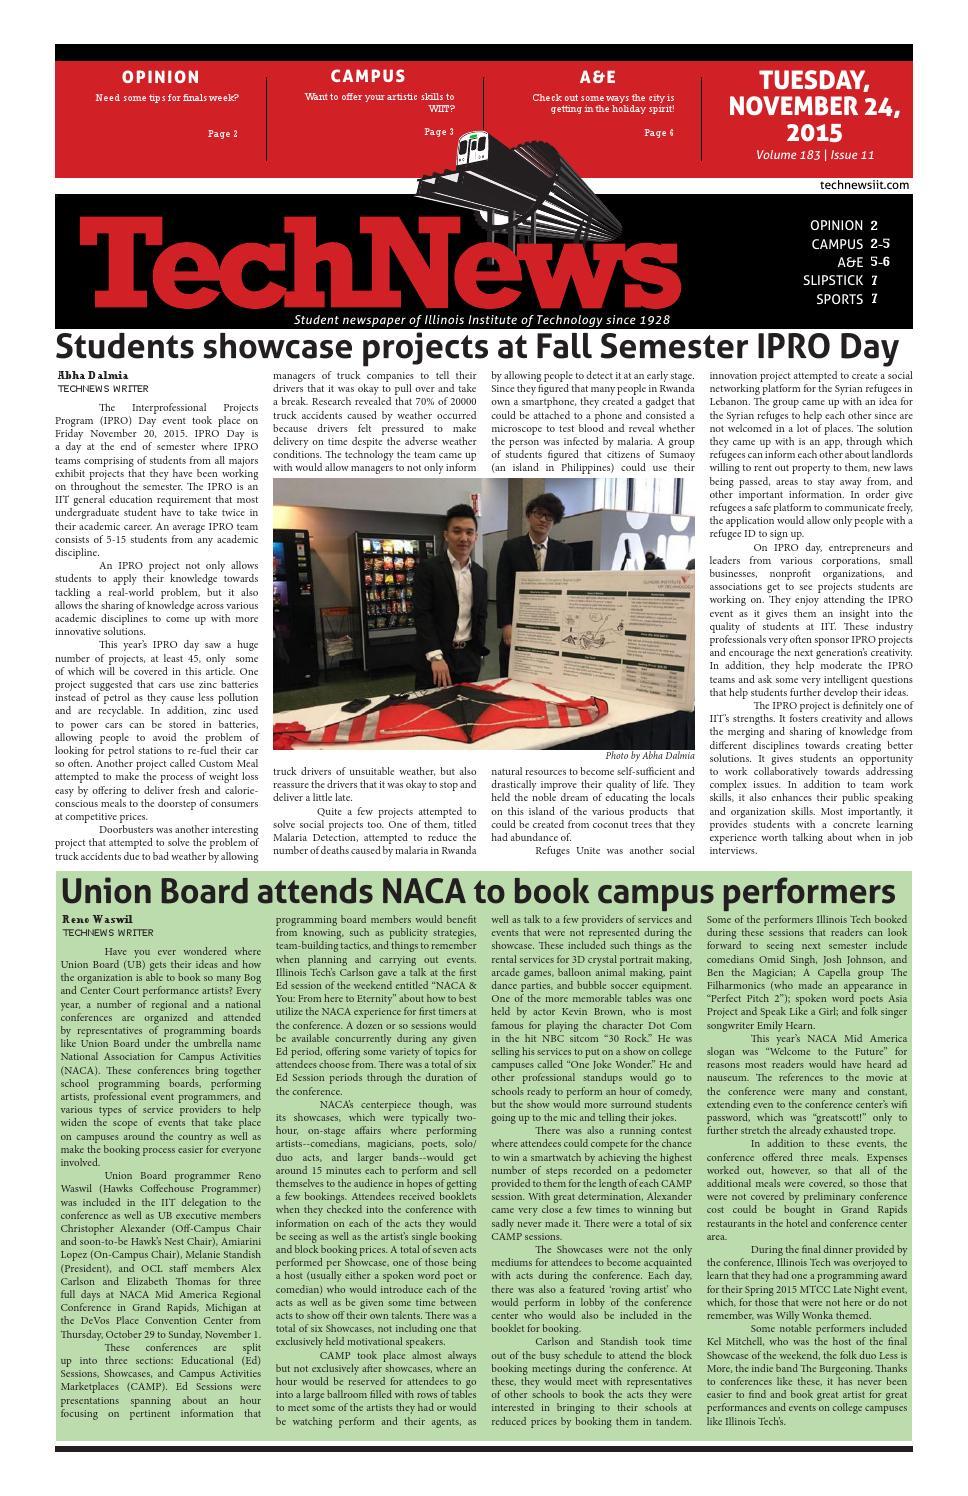 Volume 183, Issue 11 by TechNews - issuu